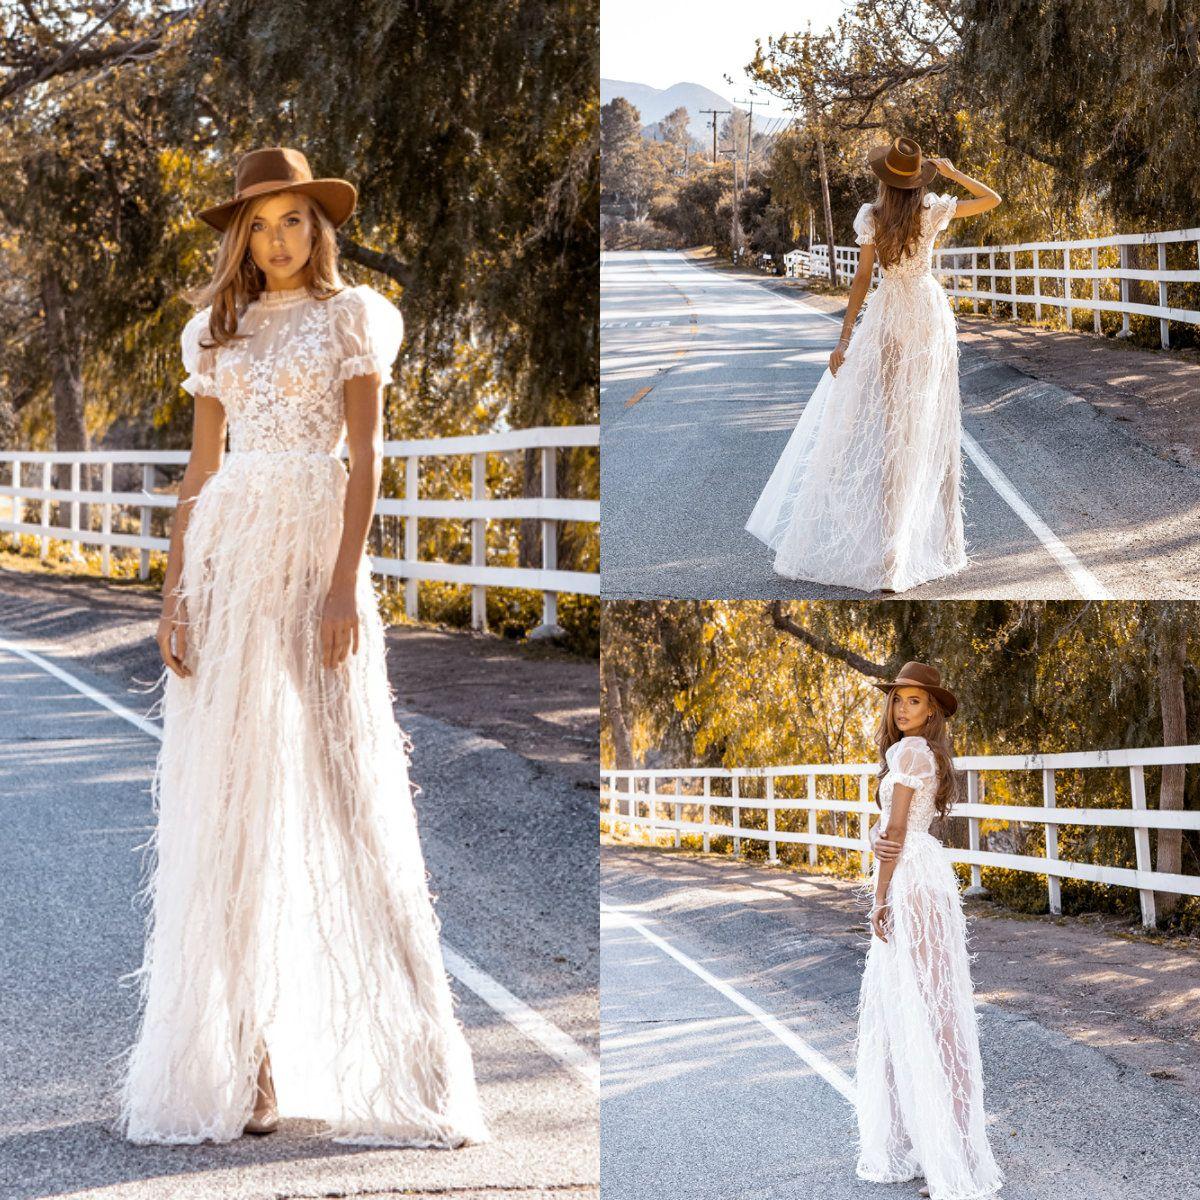 Crystal Design 2019 A Line Wedding Dresses Jewel Neck Feather Lace Appliqued Boho Wedding Dress Short Sleeves Plus Size Garden Bridal Gowns